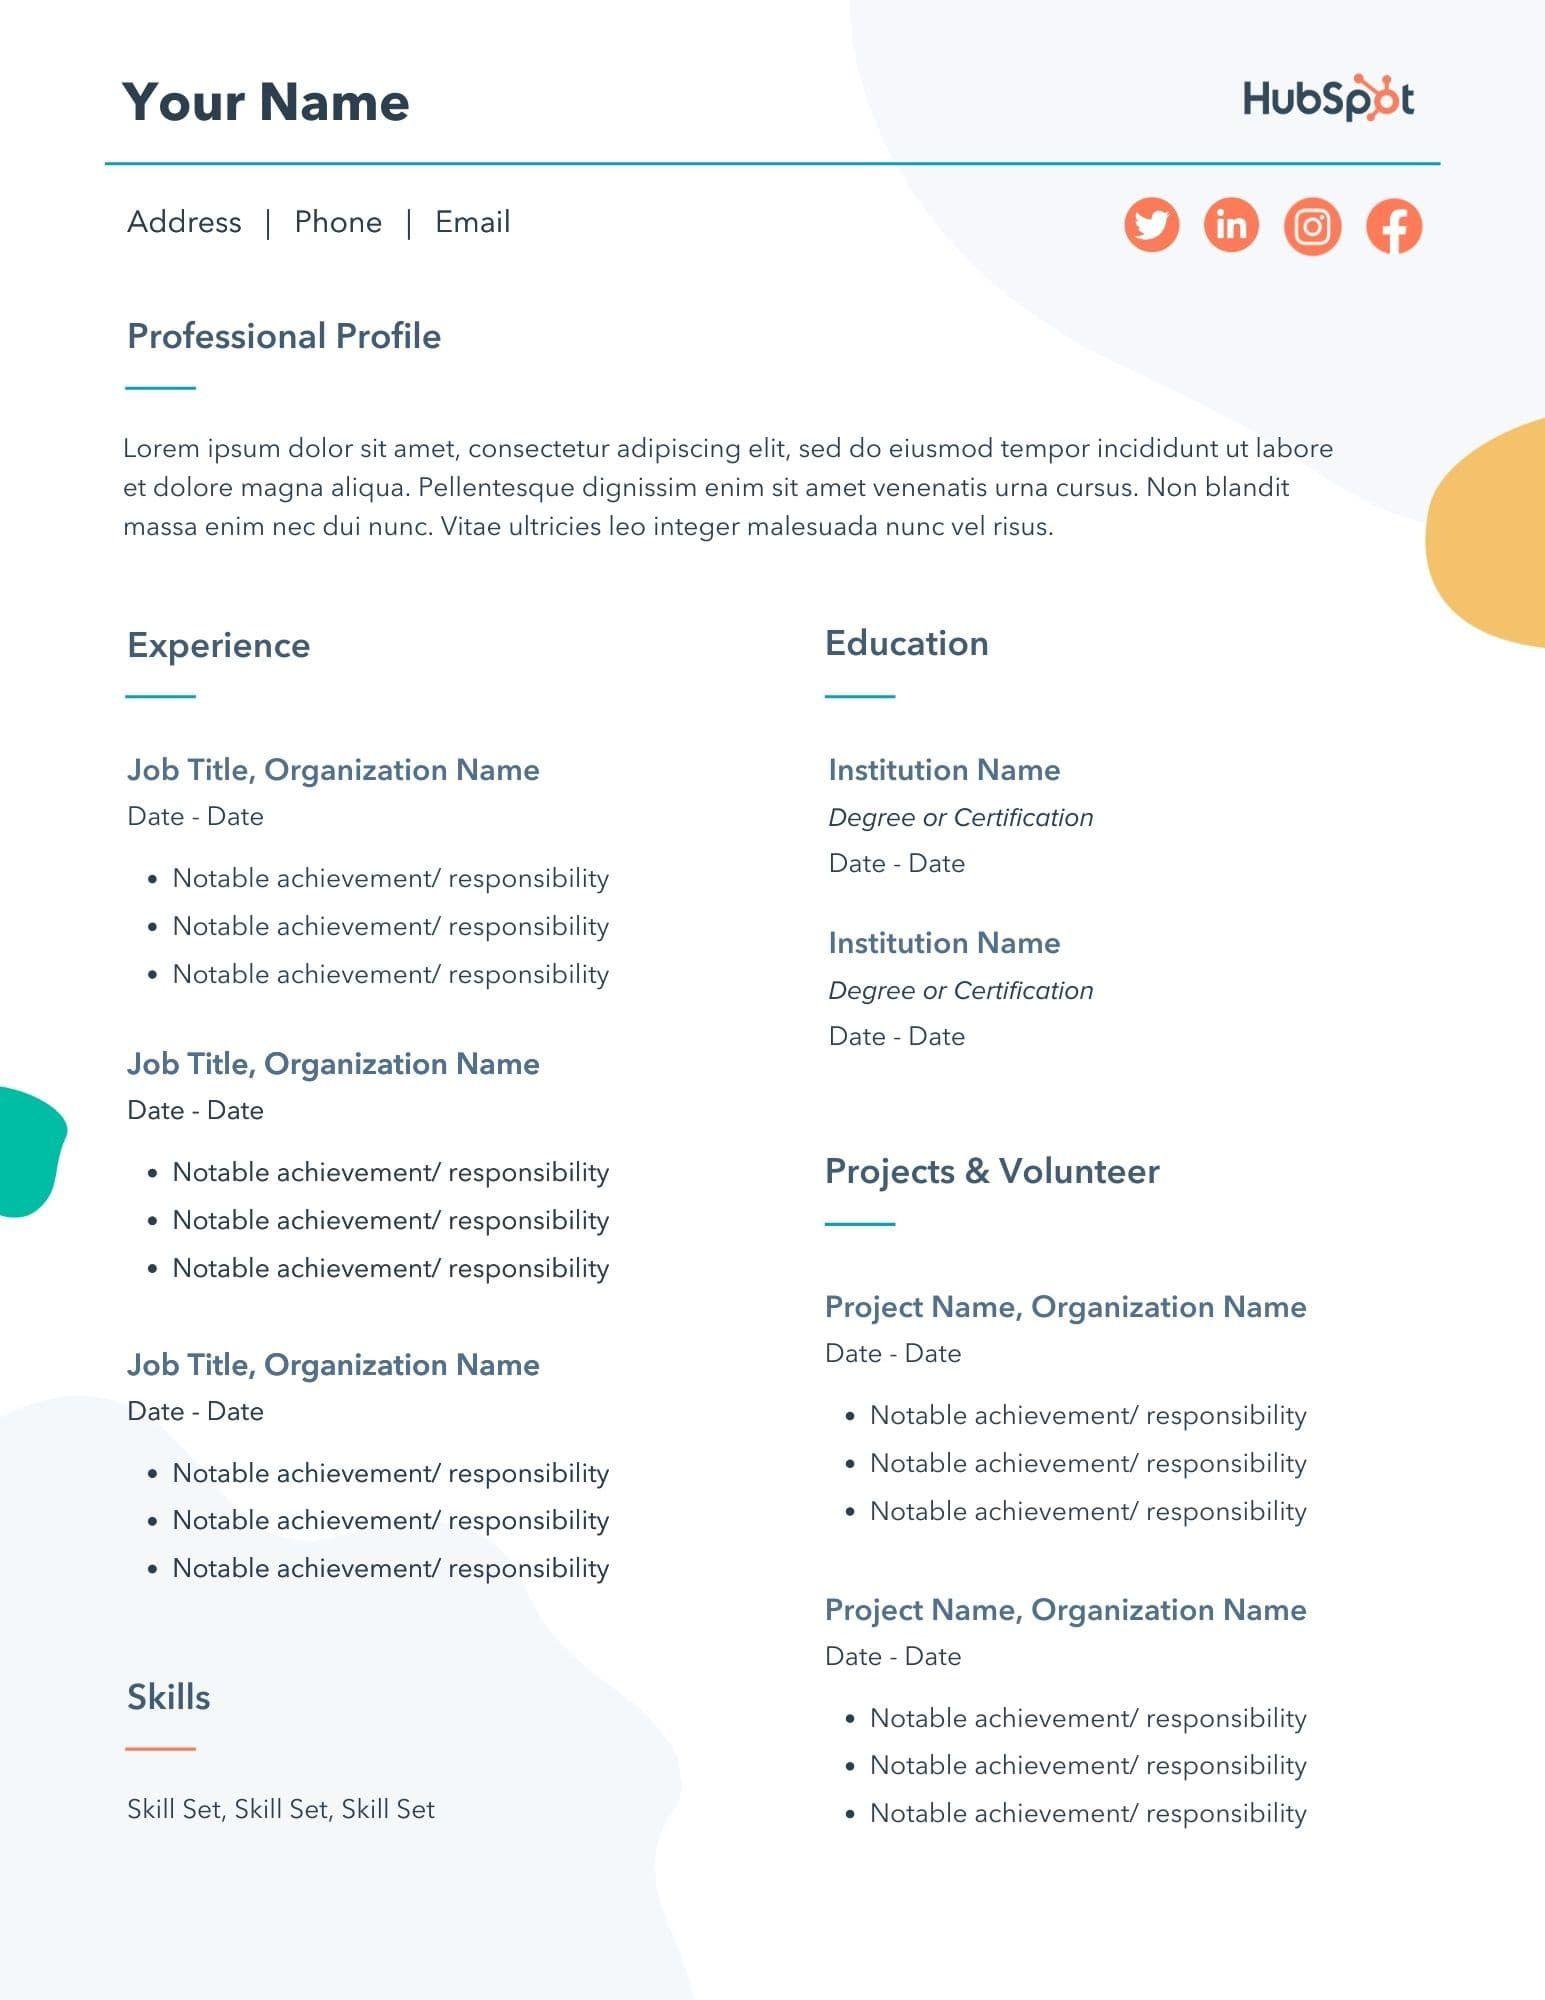 008 Wonderful Resume Template Word 2007 Free Image  Microsoft Office For MFull